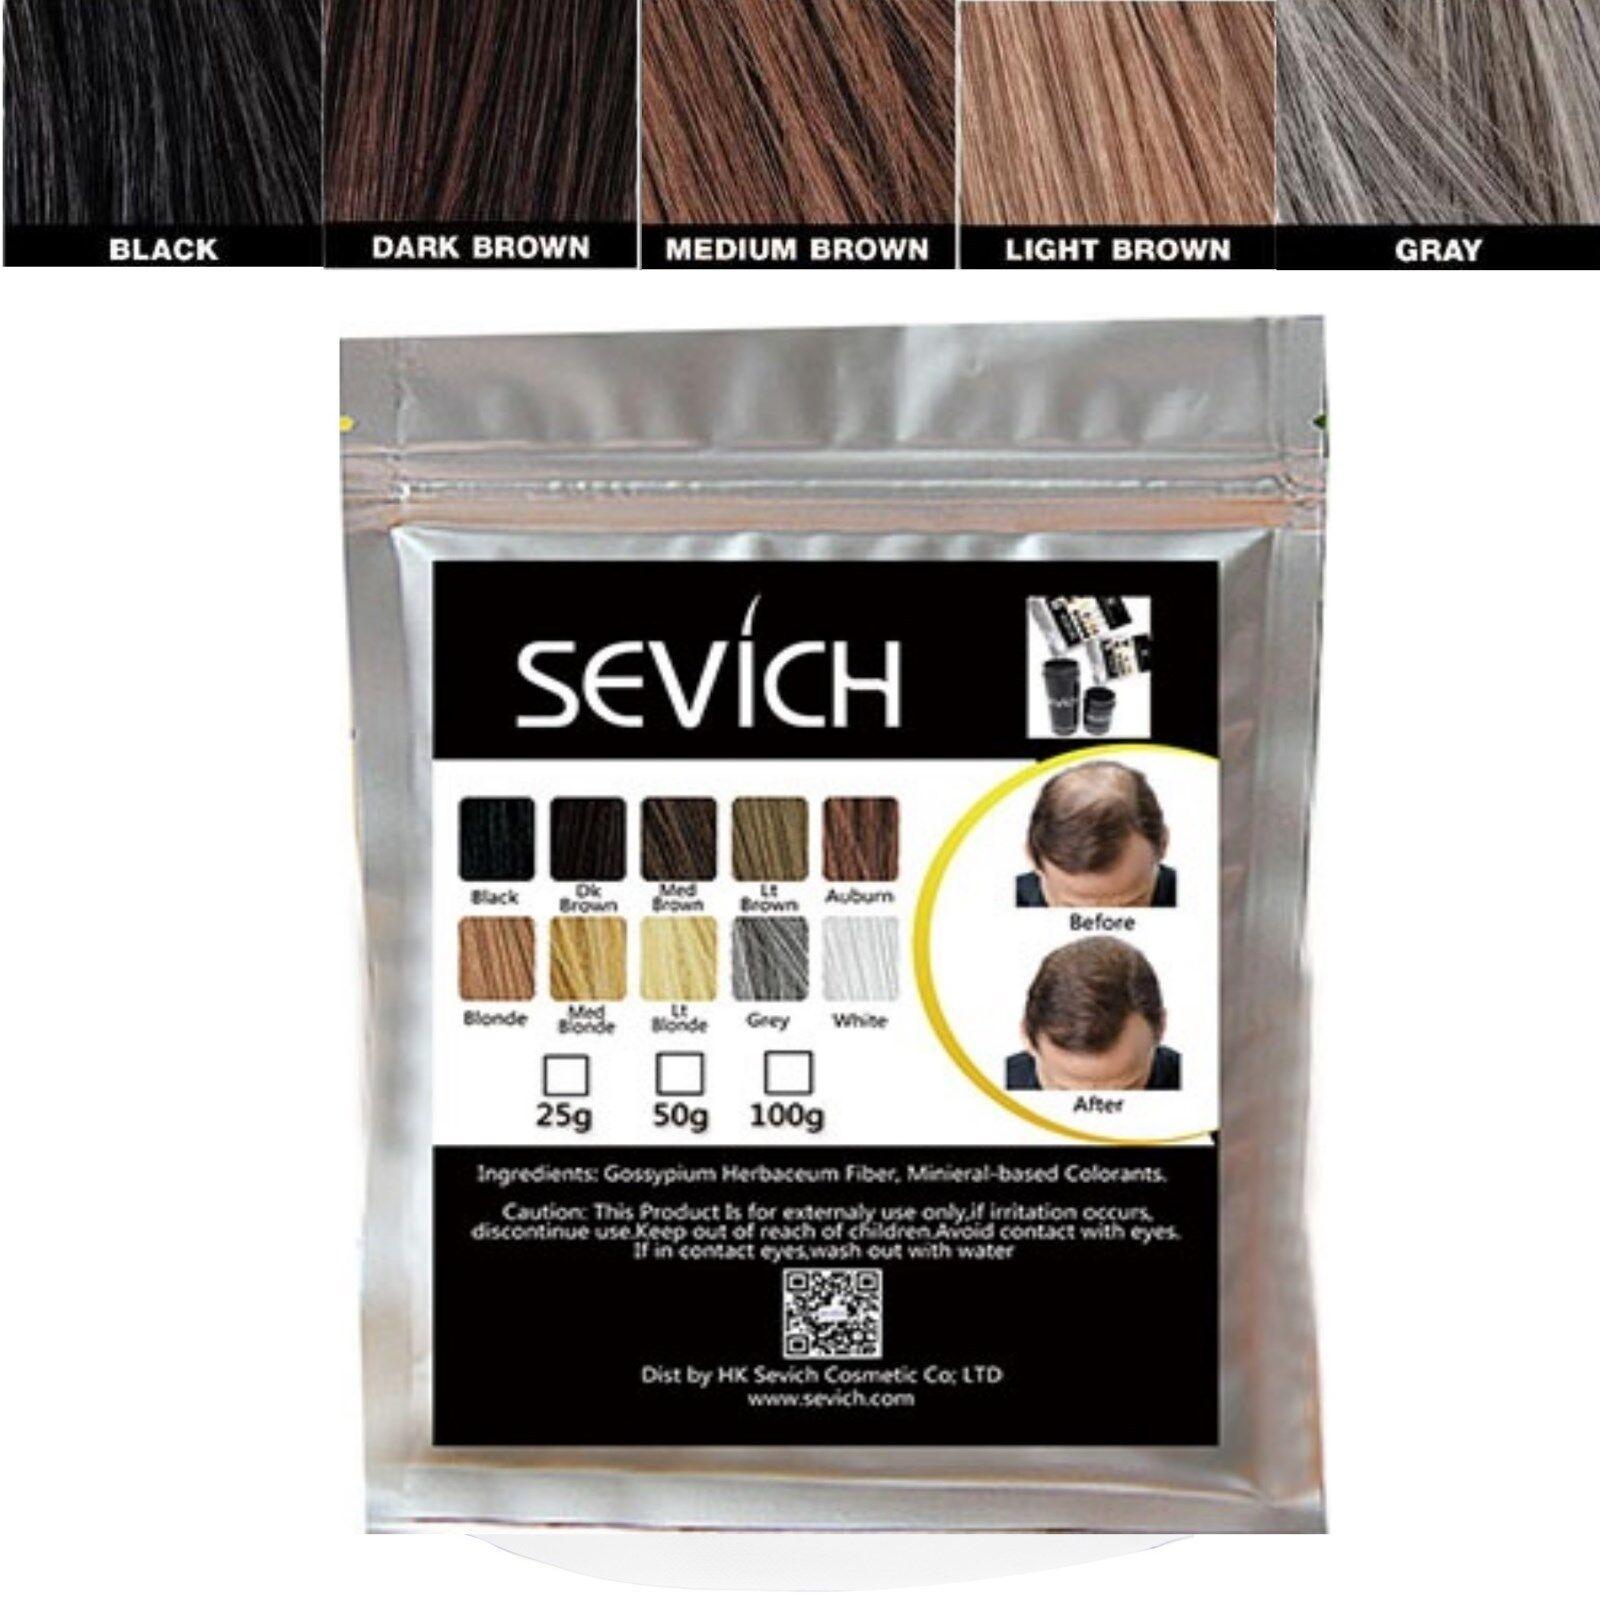 Sevich HAIR BUILDING Fibers Bulk Bag MANY COLORS SIZES Keratin FREE DELIVERY UK